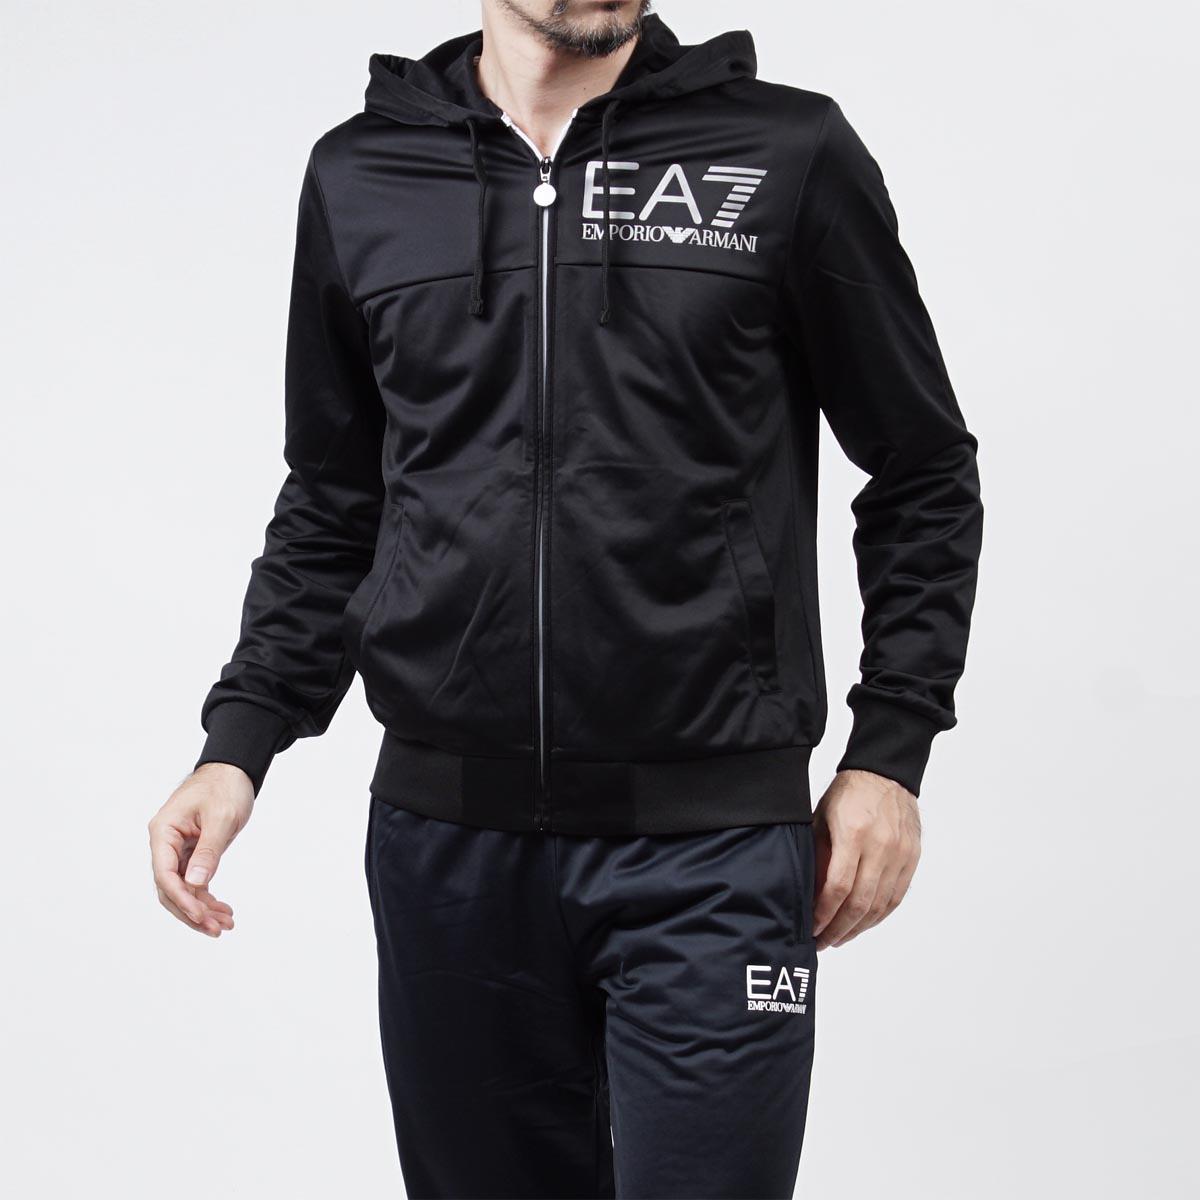 美國百分百【全新真品】Emporio Armani 外套 連帽 夾克 EA7 尼龍 運動 黑色 XS S號 F825